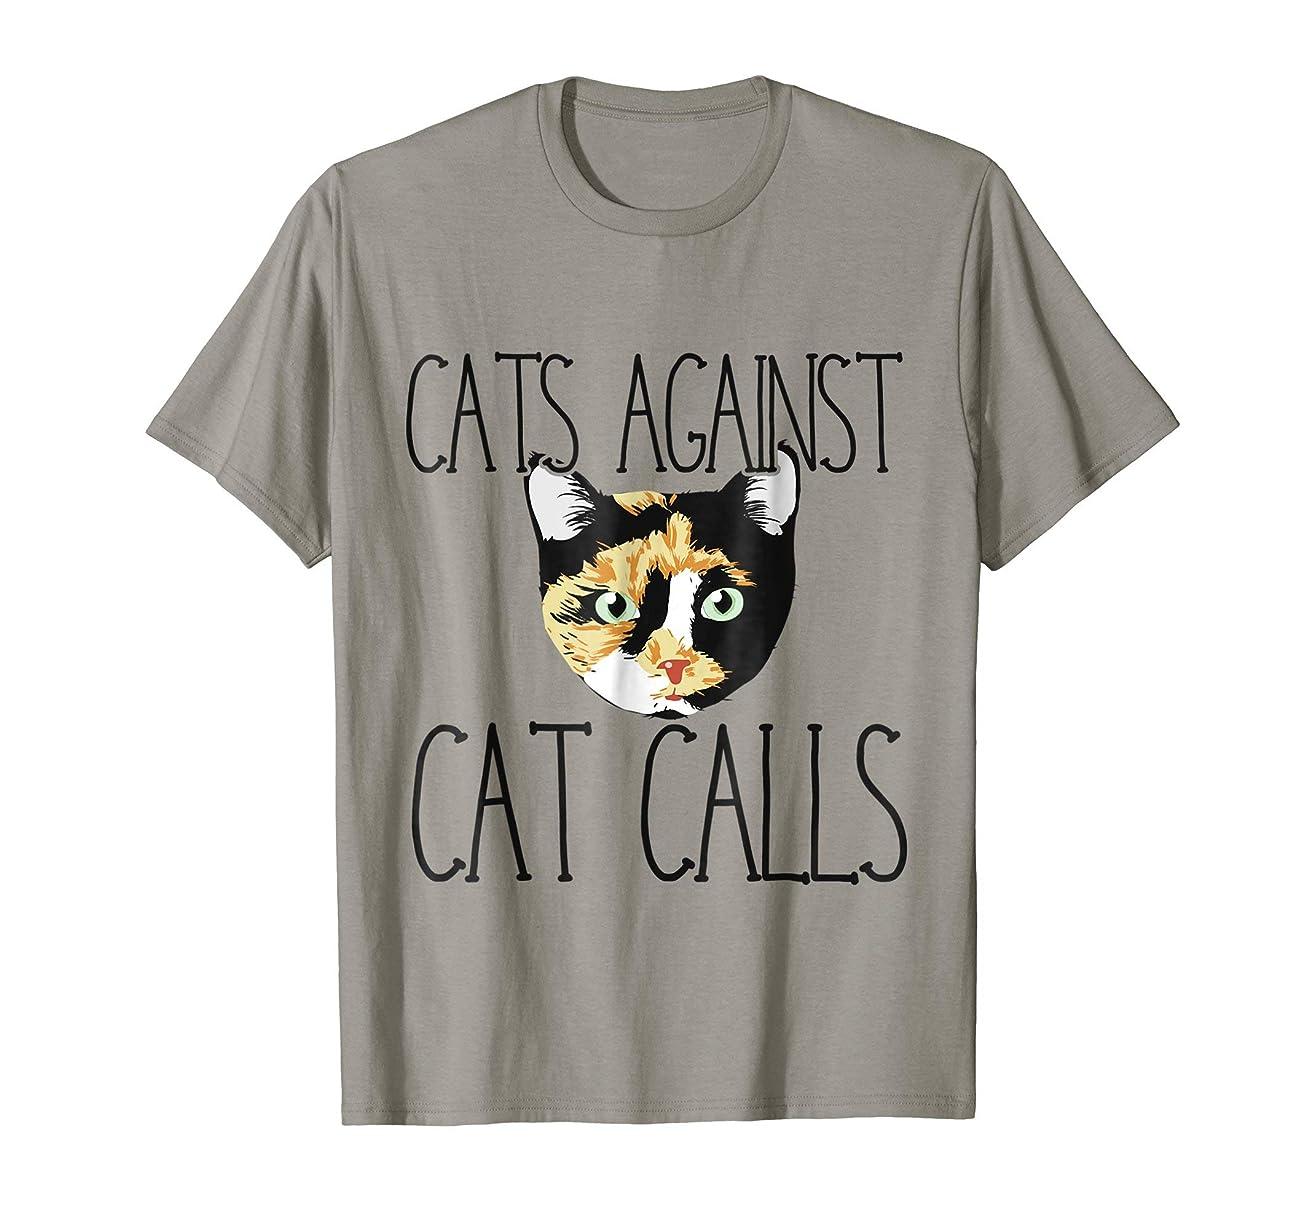 Cats against catcalls shirt feminist t-shirt calico cat